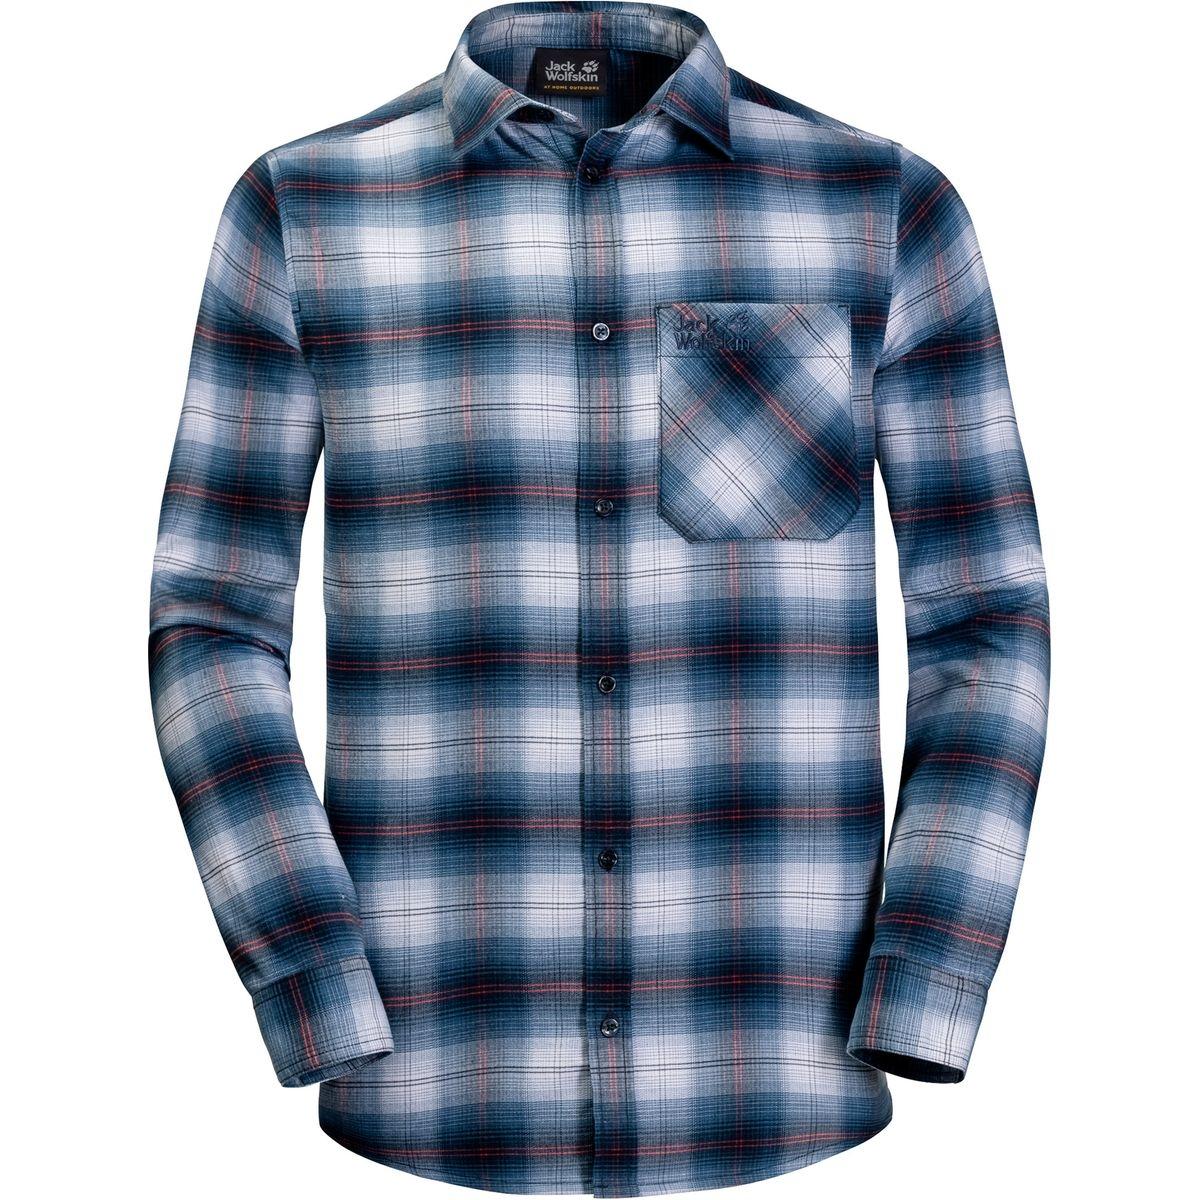 Light Valley - T-shirt manches longues Homme - bleu/blanc